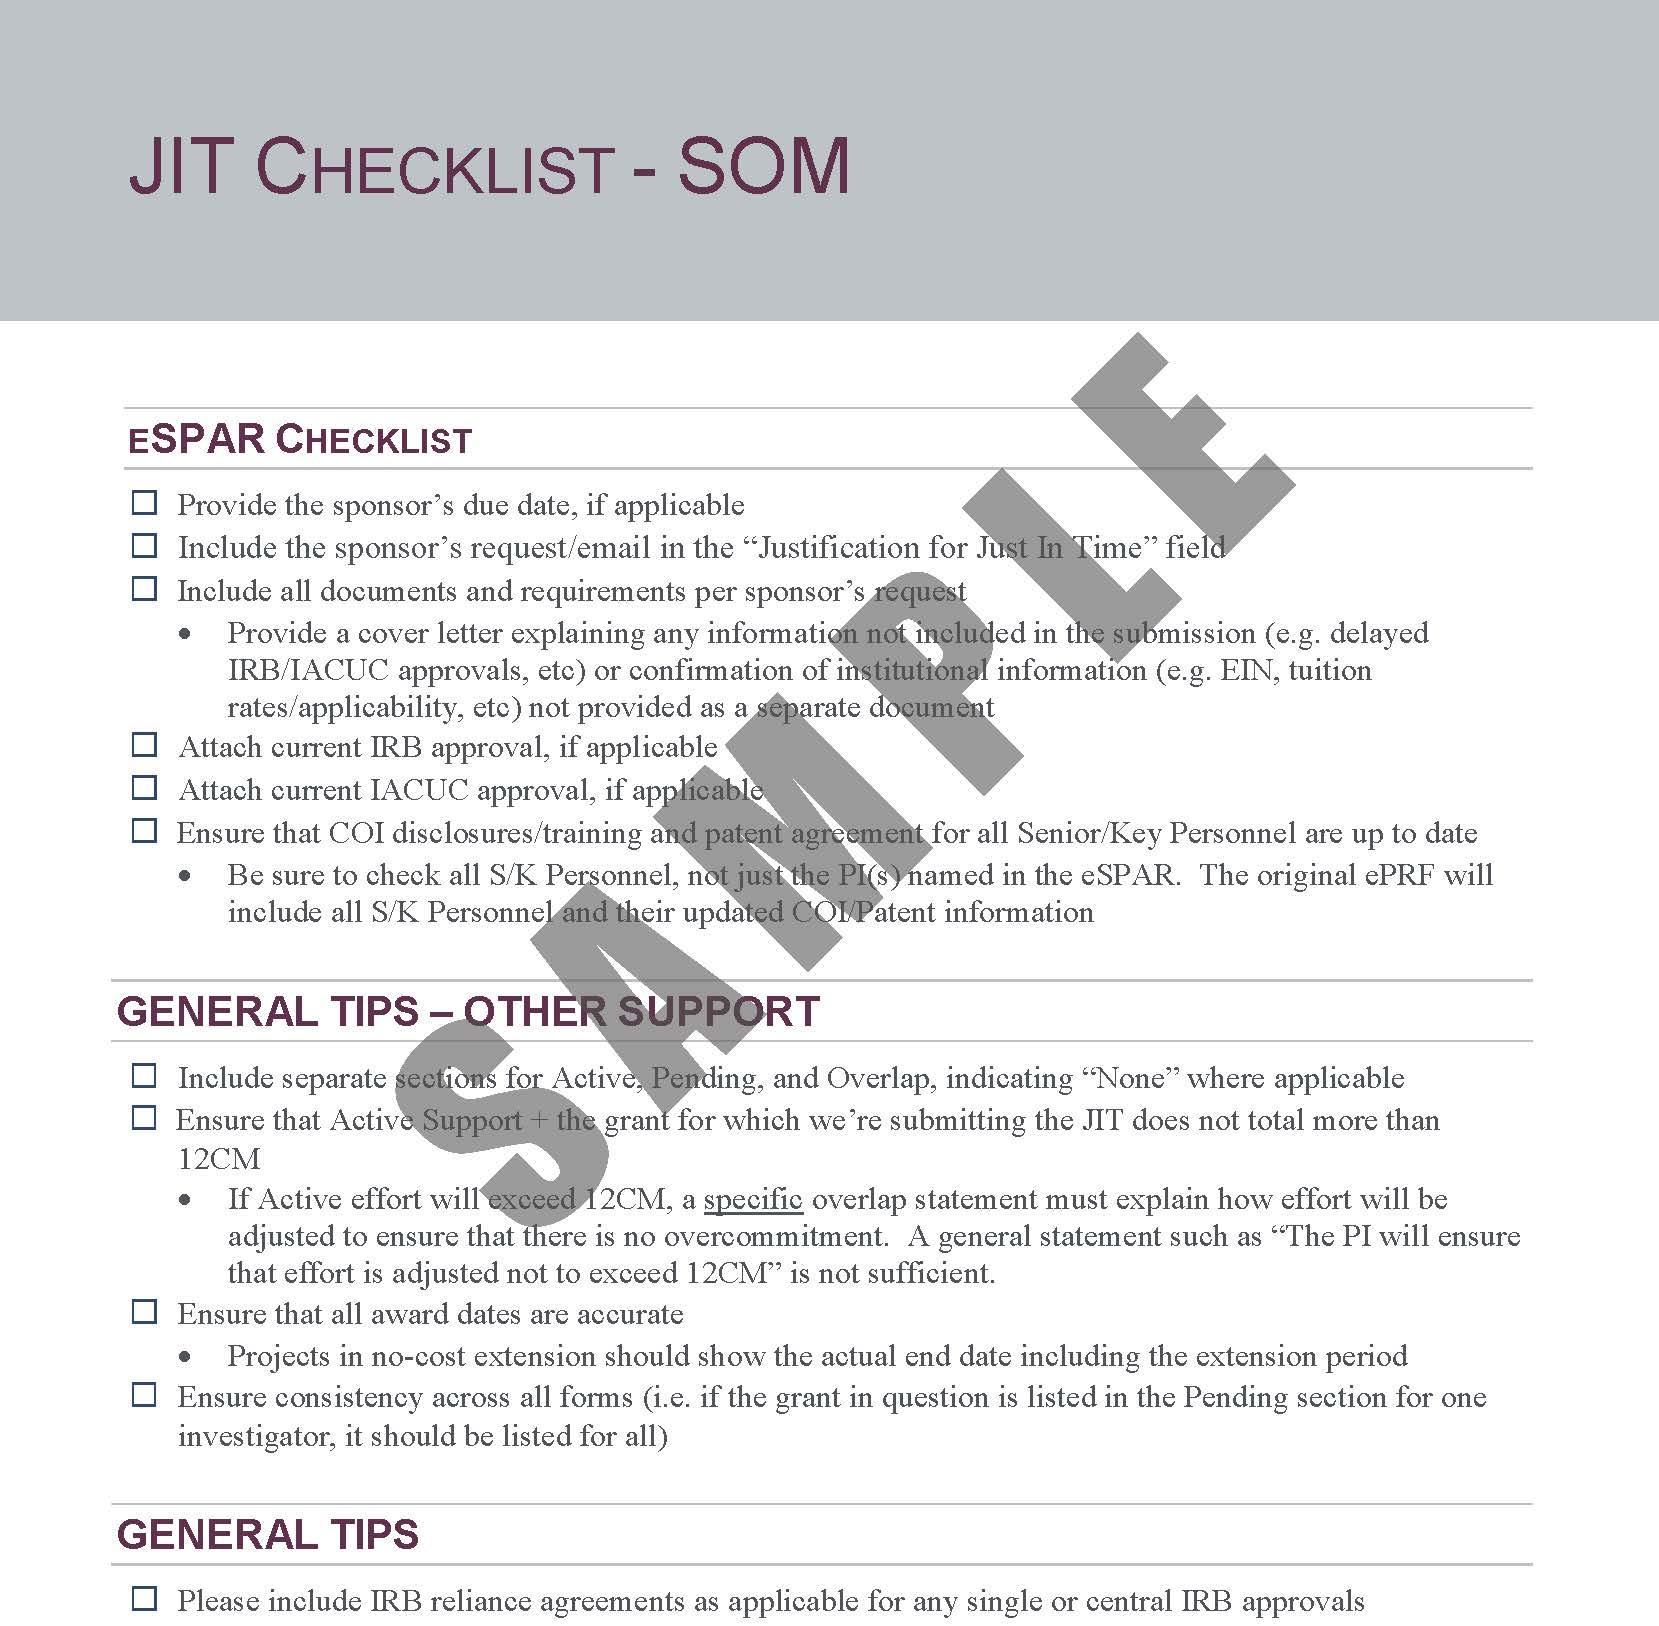 JIT Checklist